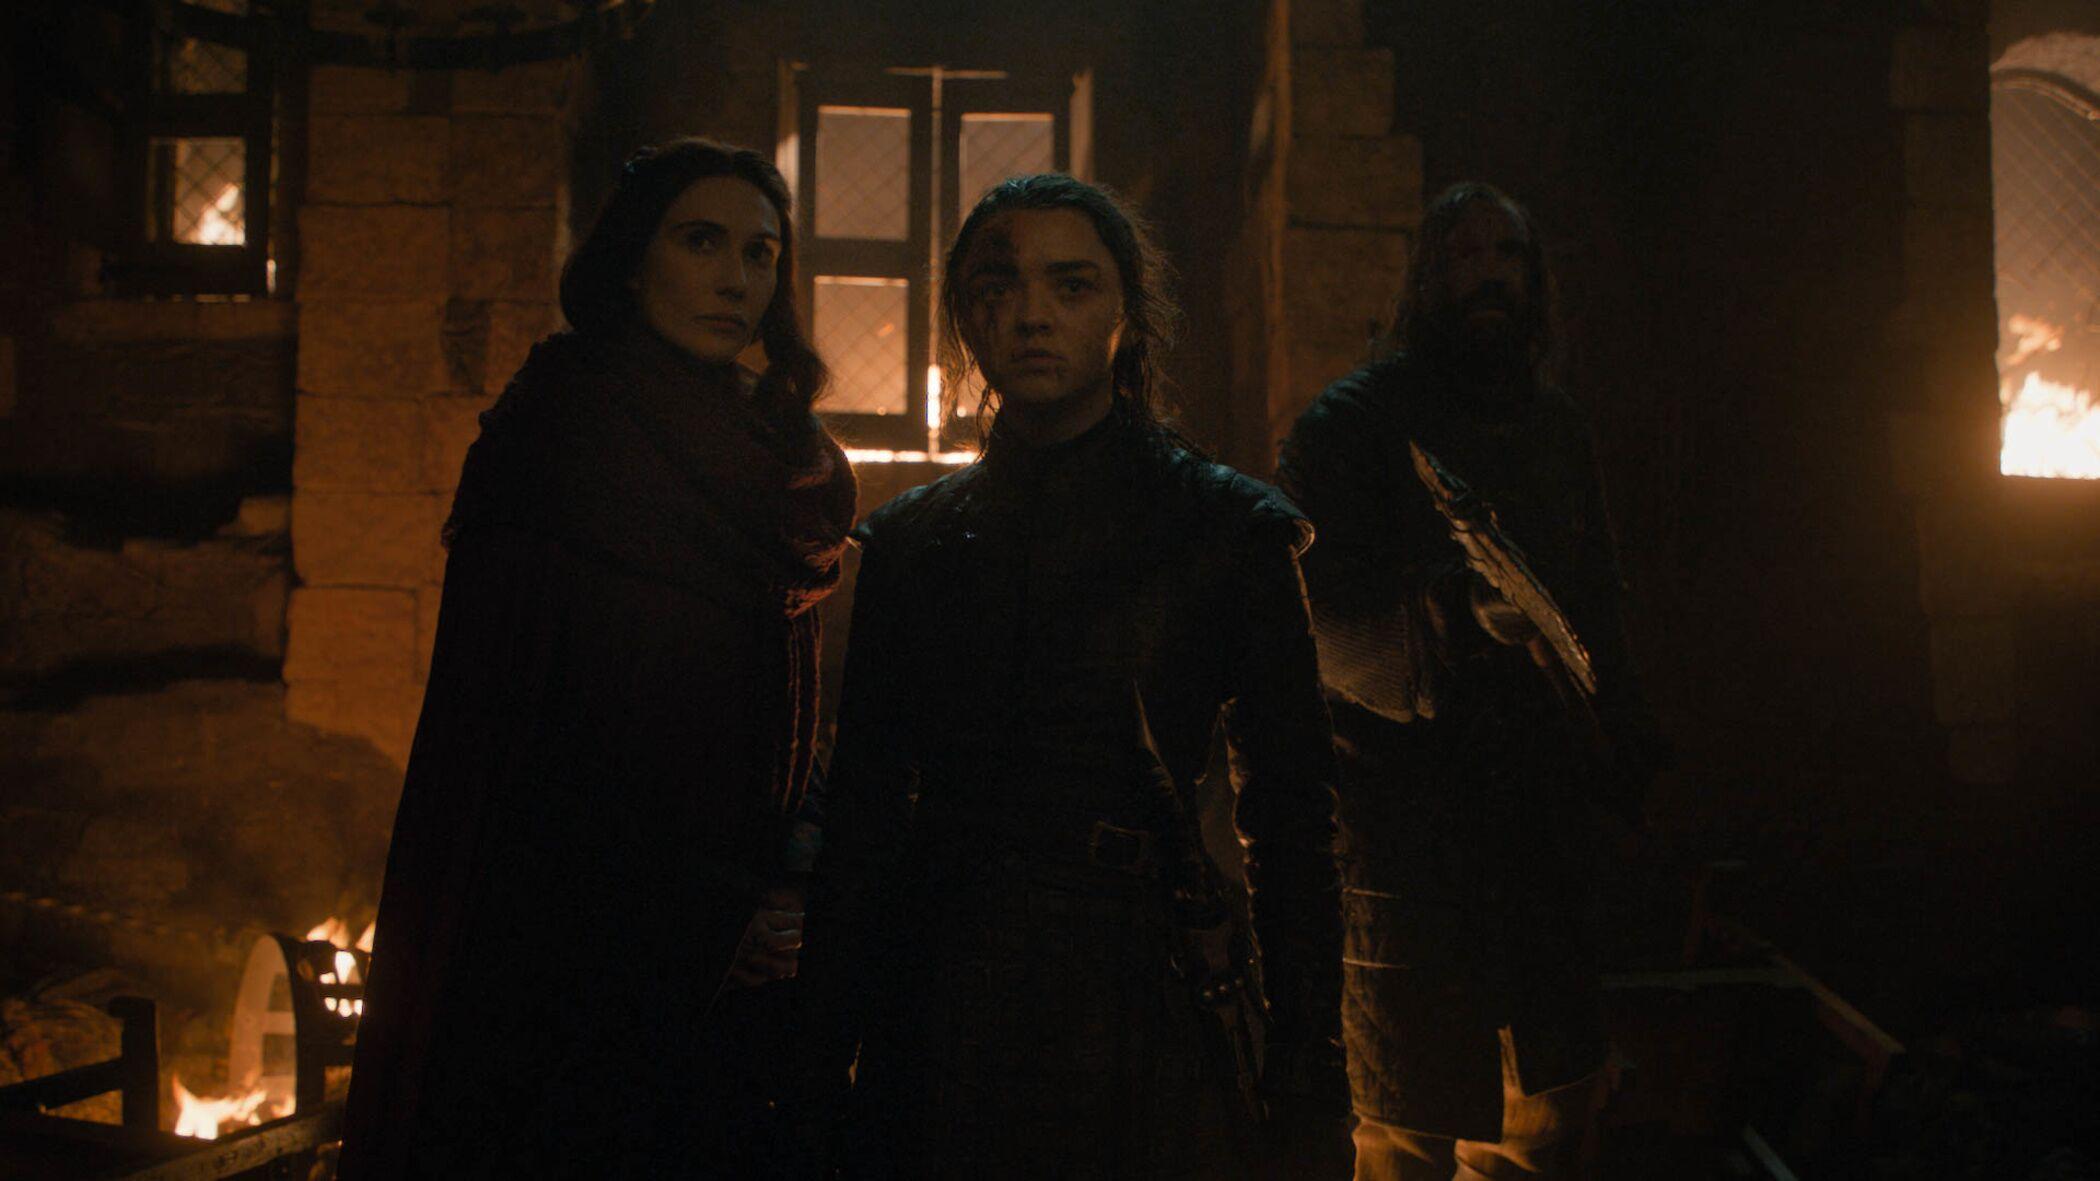 Kit Harington as Jon Snow in Game of Thrones / Photo: Courtesy of HBO